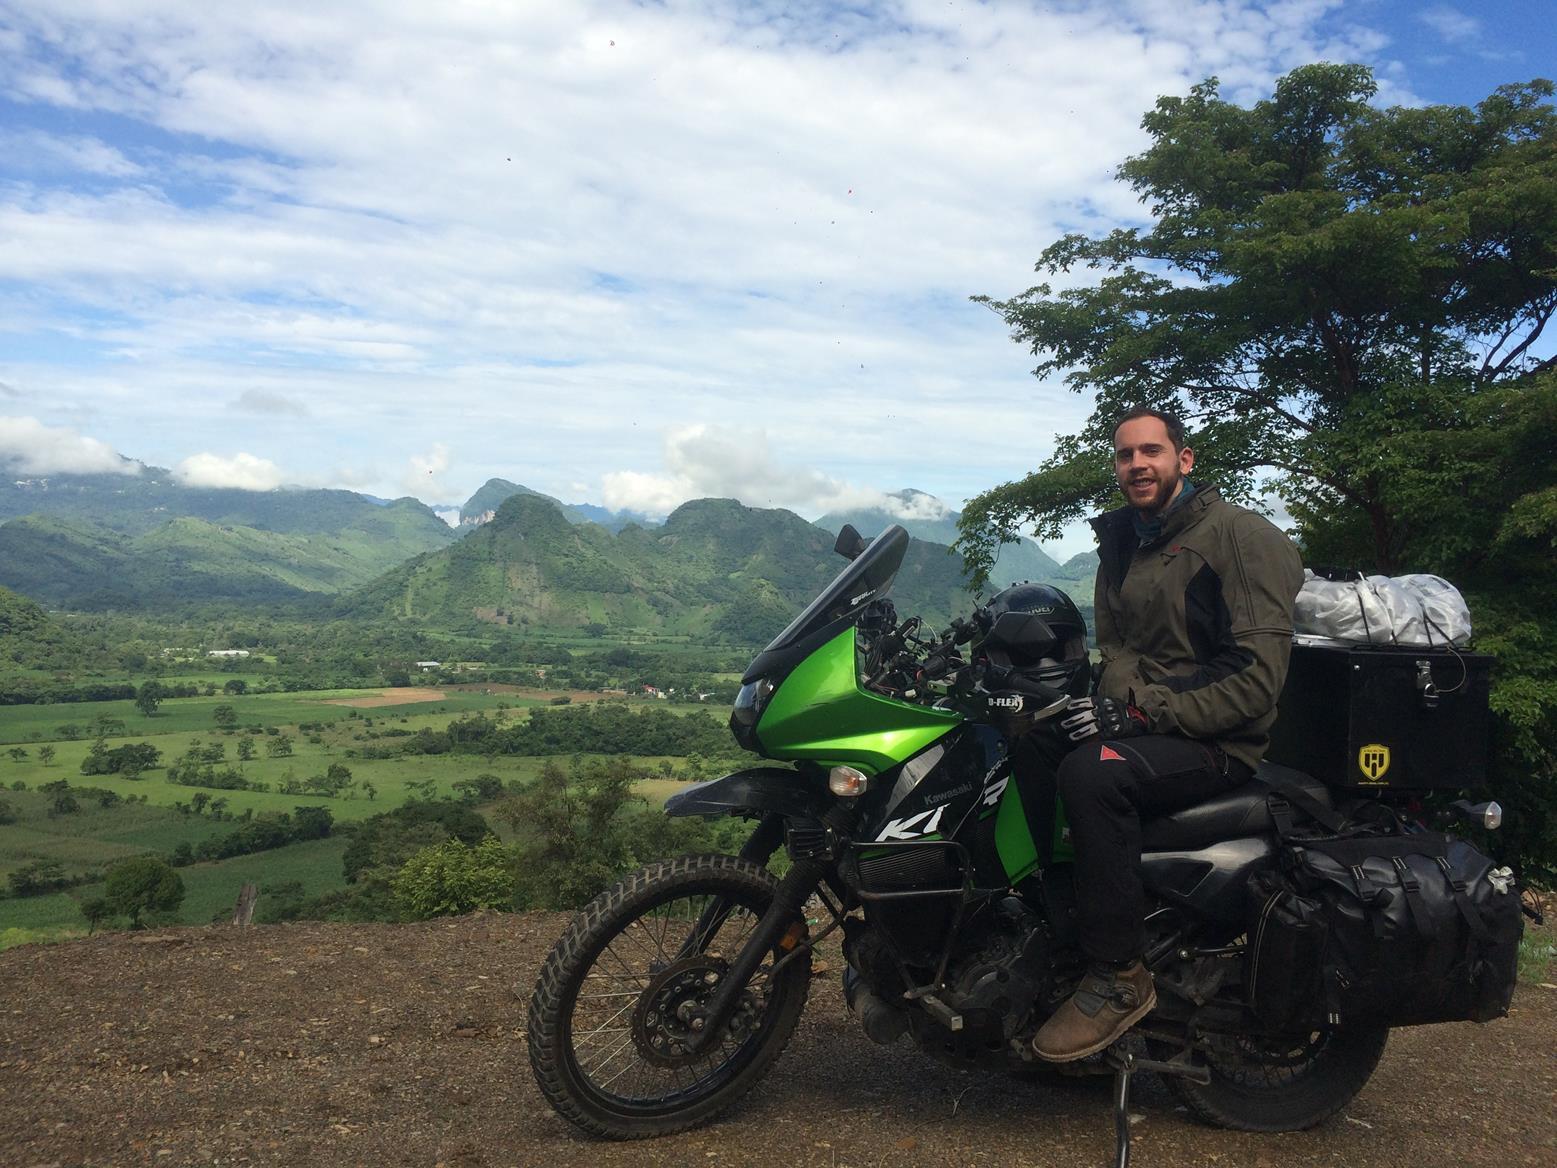 Kelias Visor Clear inventor Elijah Anisovets with his Kawasaki KLR650